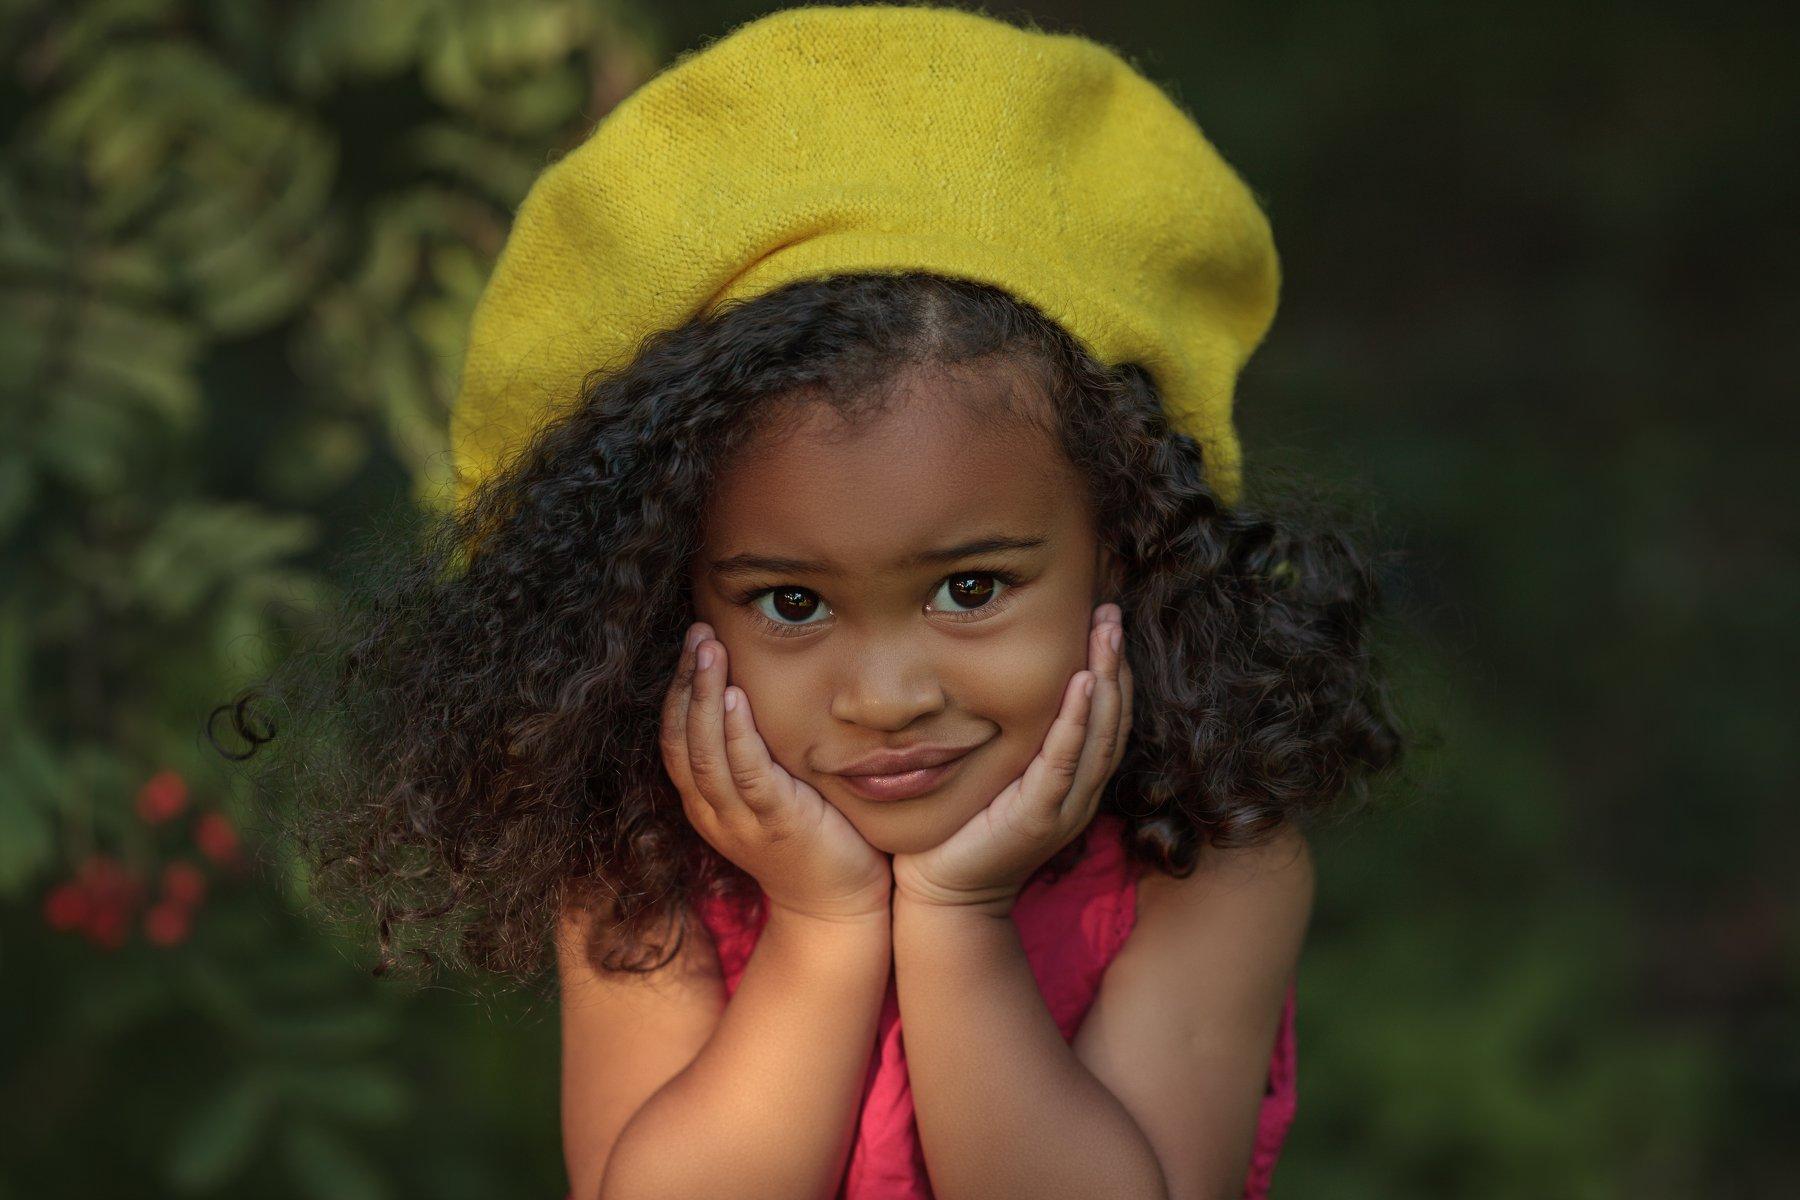 #gazinaphoto #best_russian_kids #thechildrenoftheworld #ourchildrenphoto , Kate Gazina